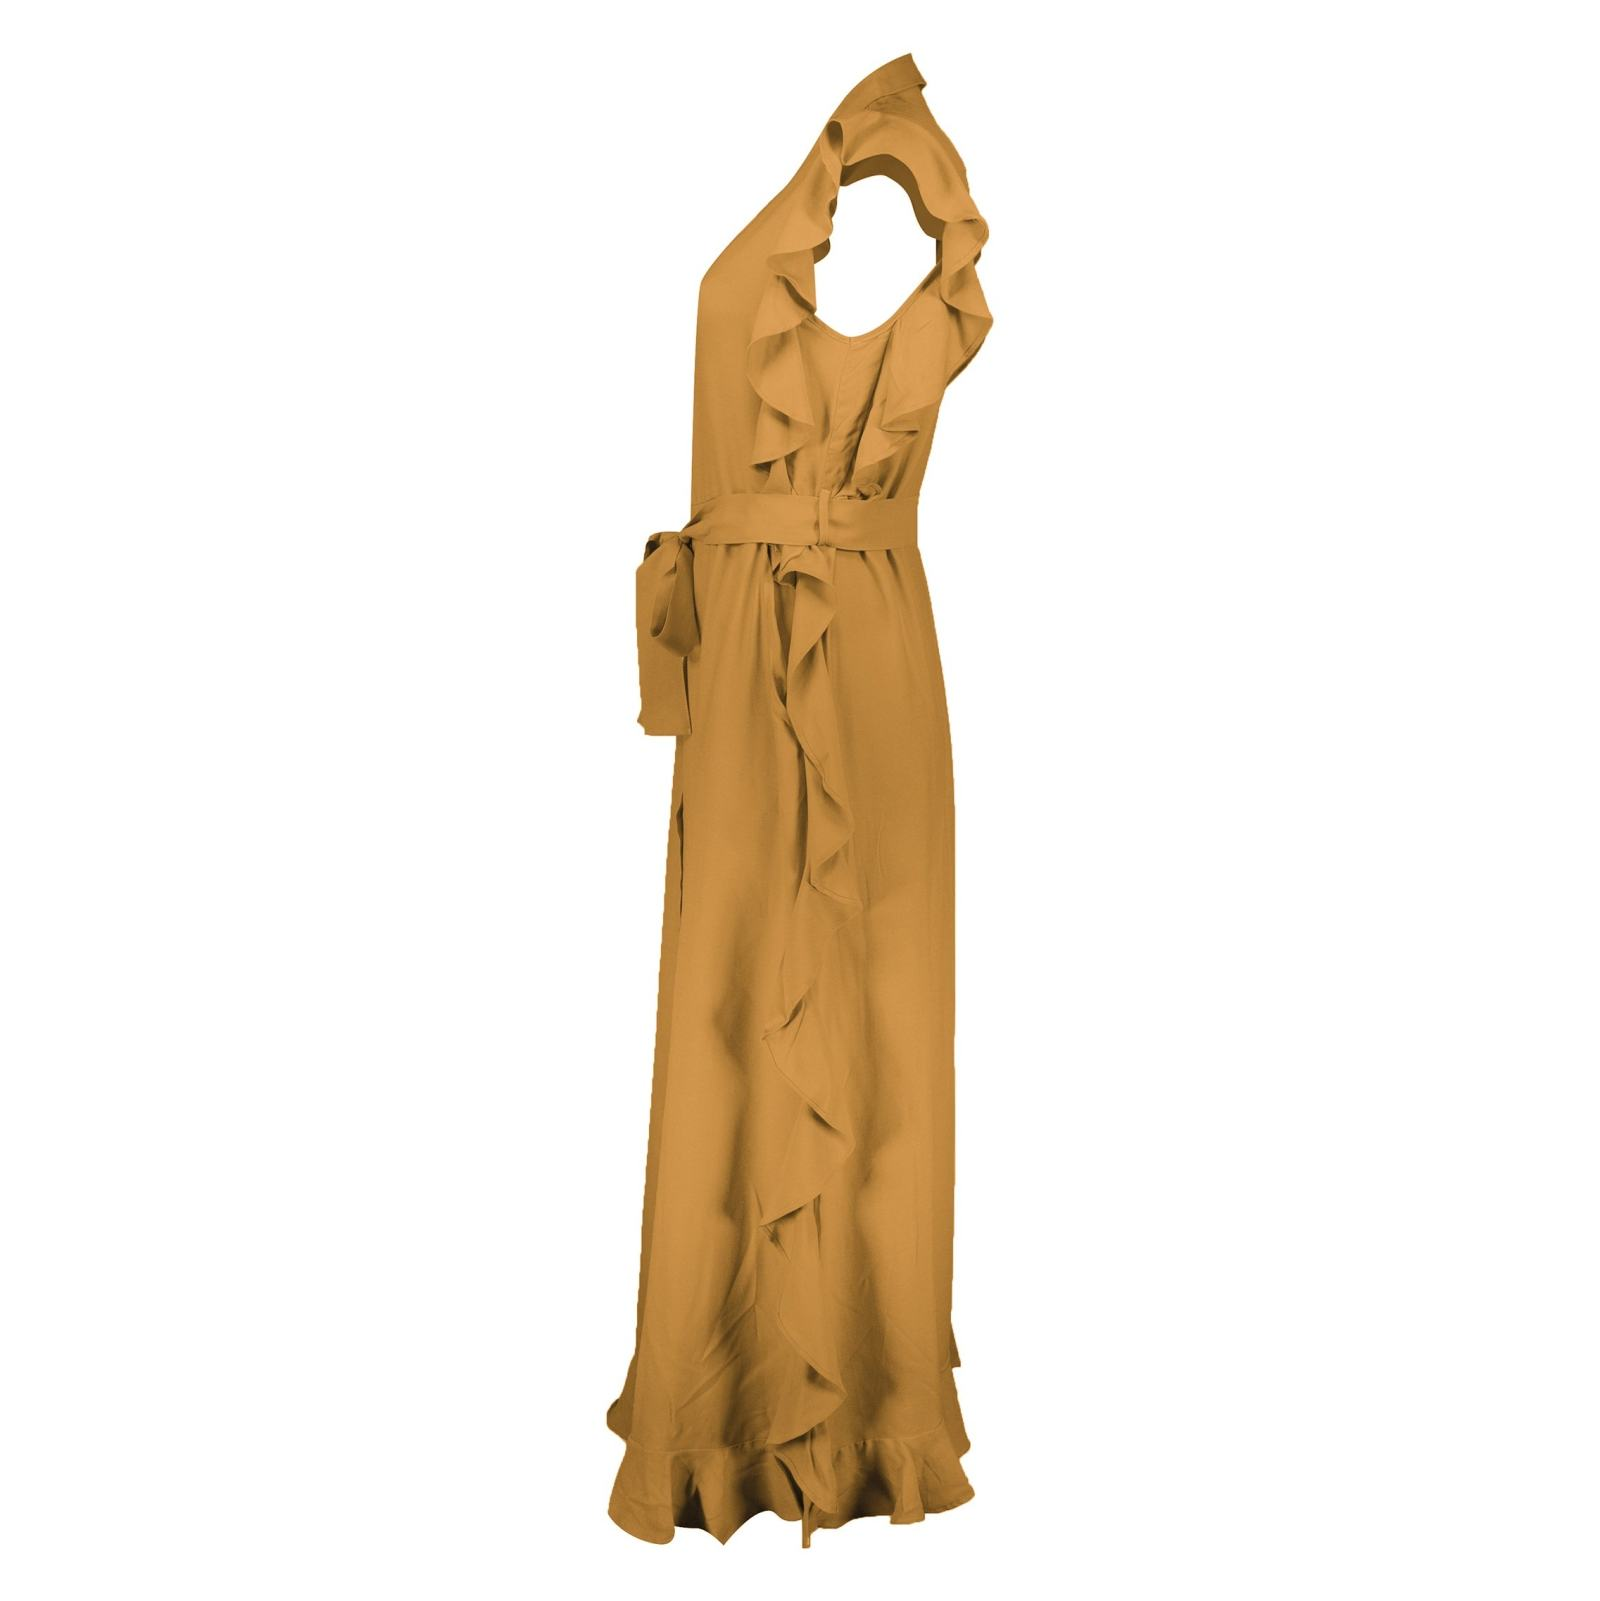 پیراهن ویسکوز بلند زنانه - کوتون - نارنجي - 3